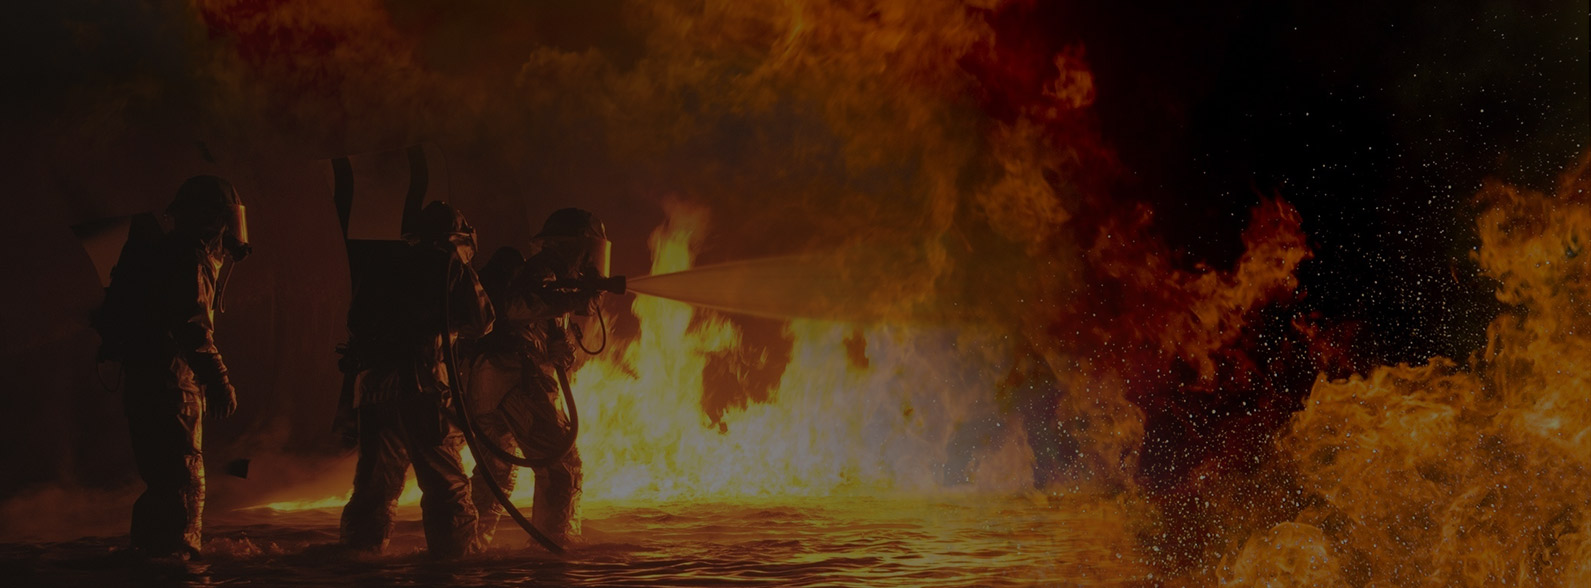 Fire Safety Equipment Maintenance in Queensland